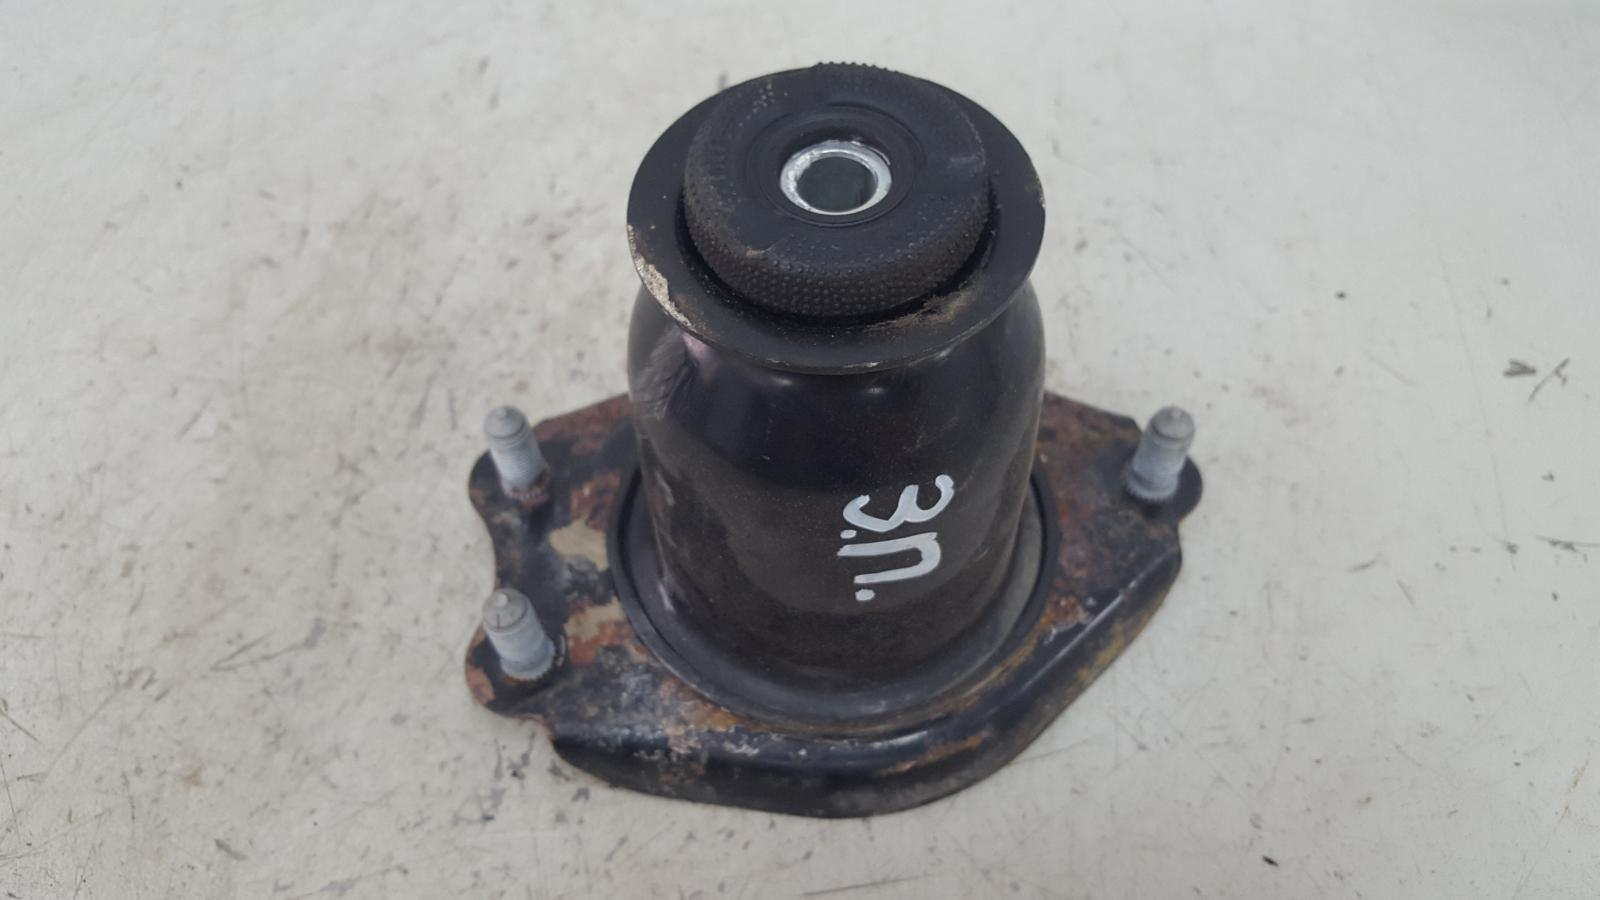 Опора стойки Toyota Avensis 2 T250 1ZZ-FE 1.8Л 2008 задняя правая